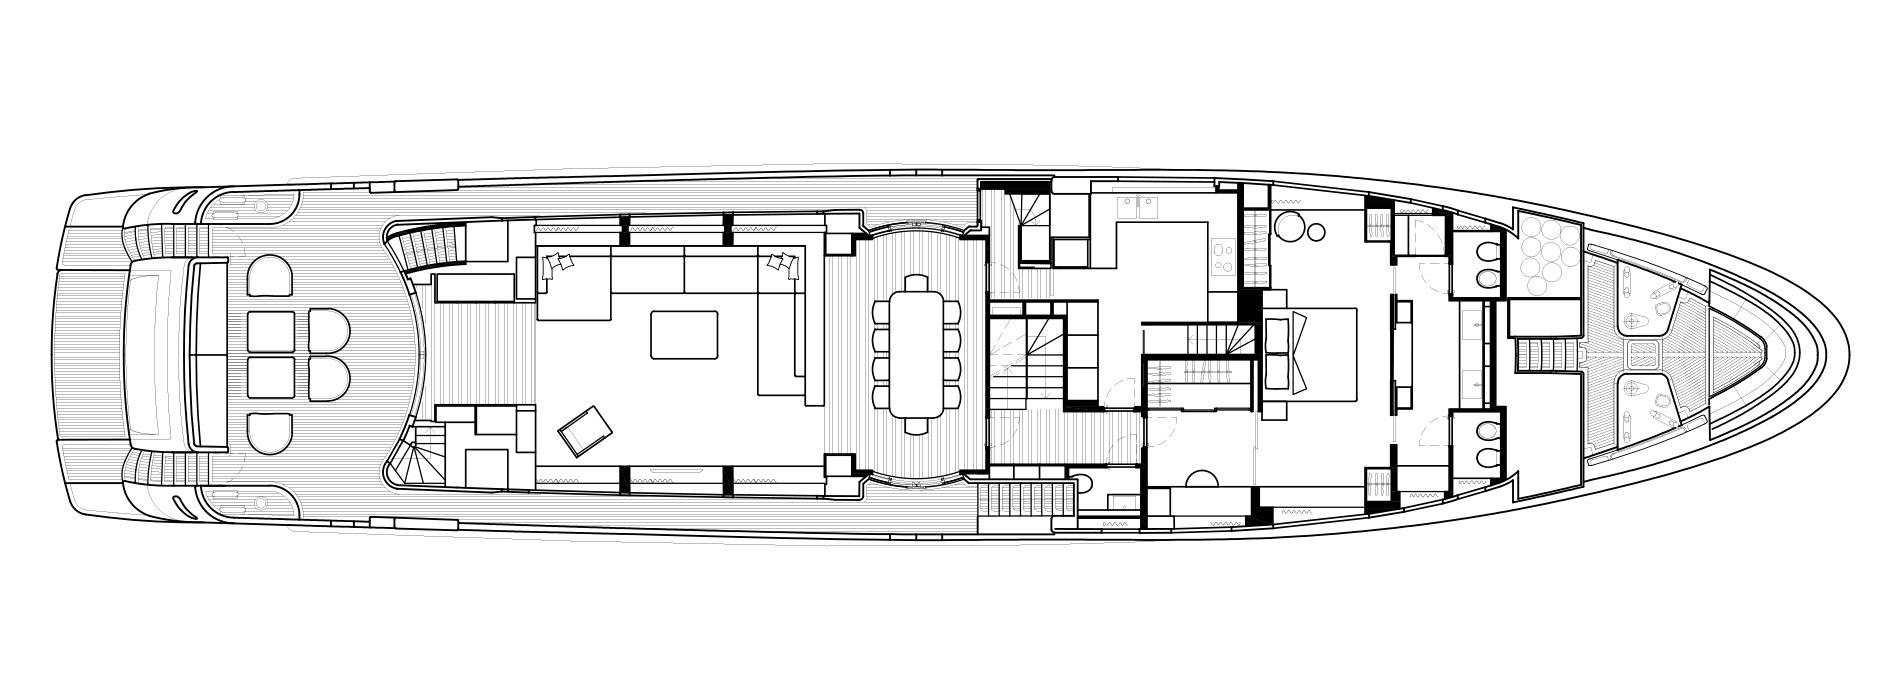 Sanlorenzo Yachts SD126 主甲板 Versione A